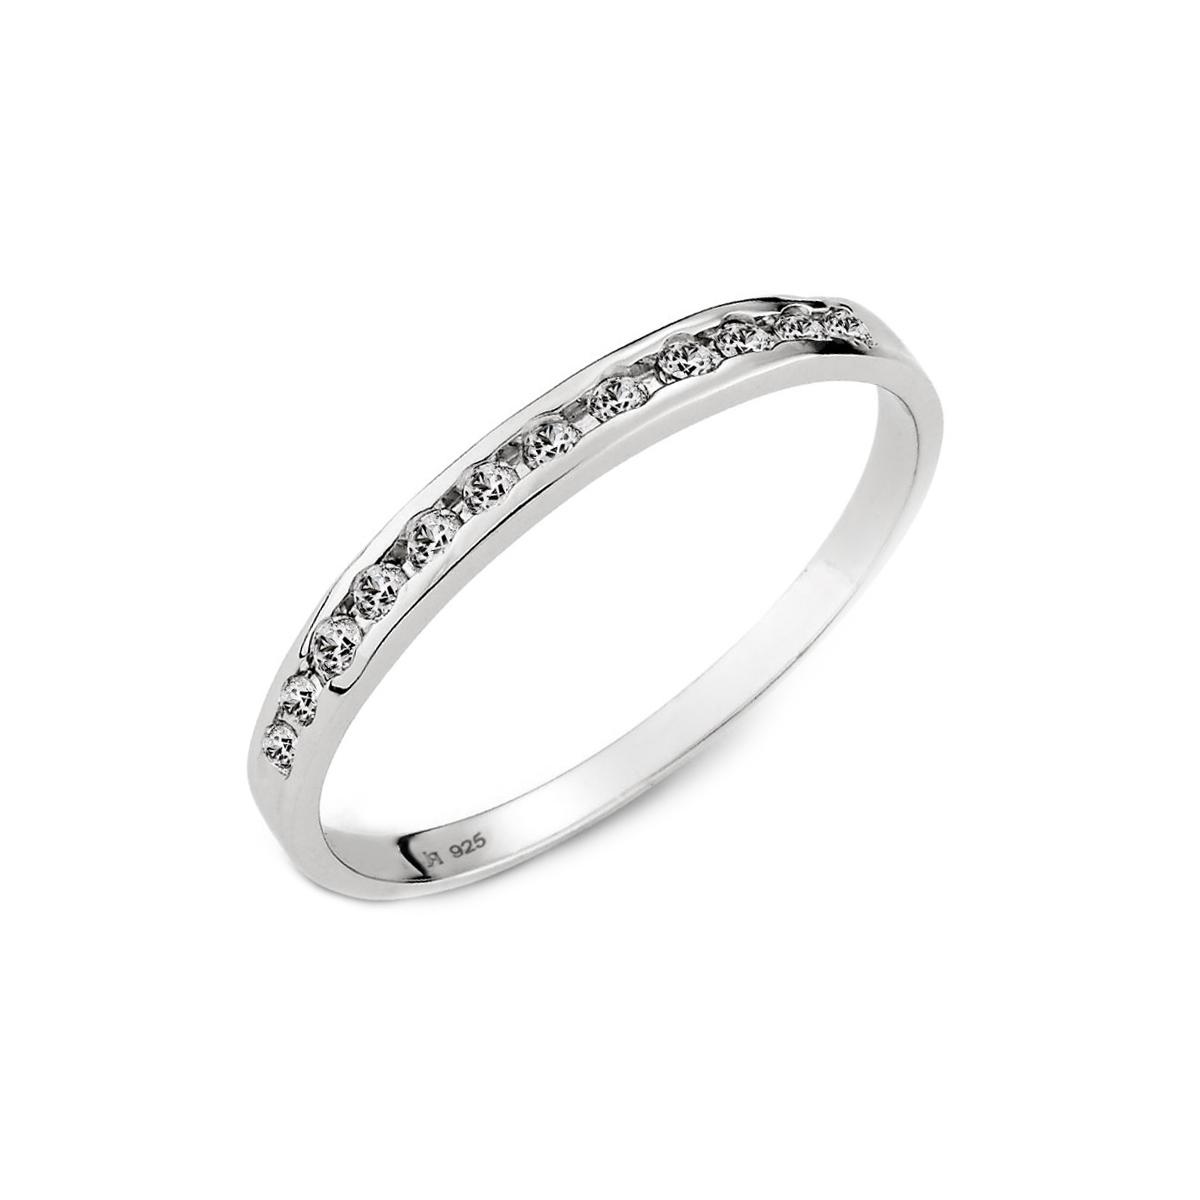 KSW268 戀愛節奏細款排鑽戒指